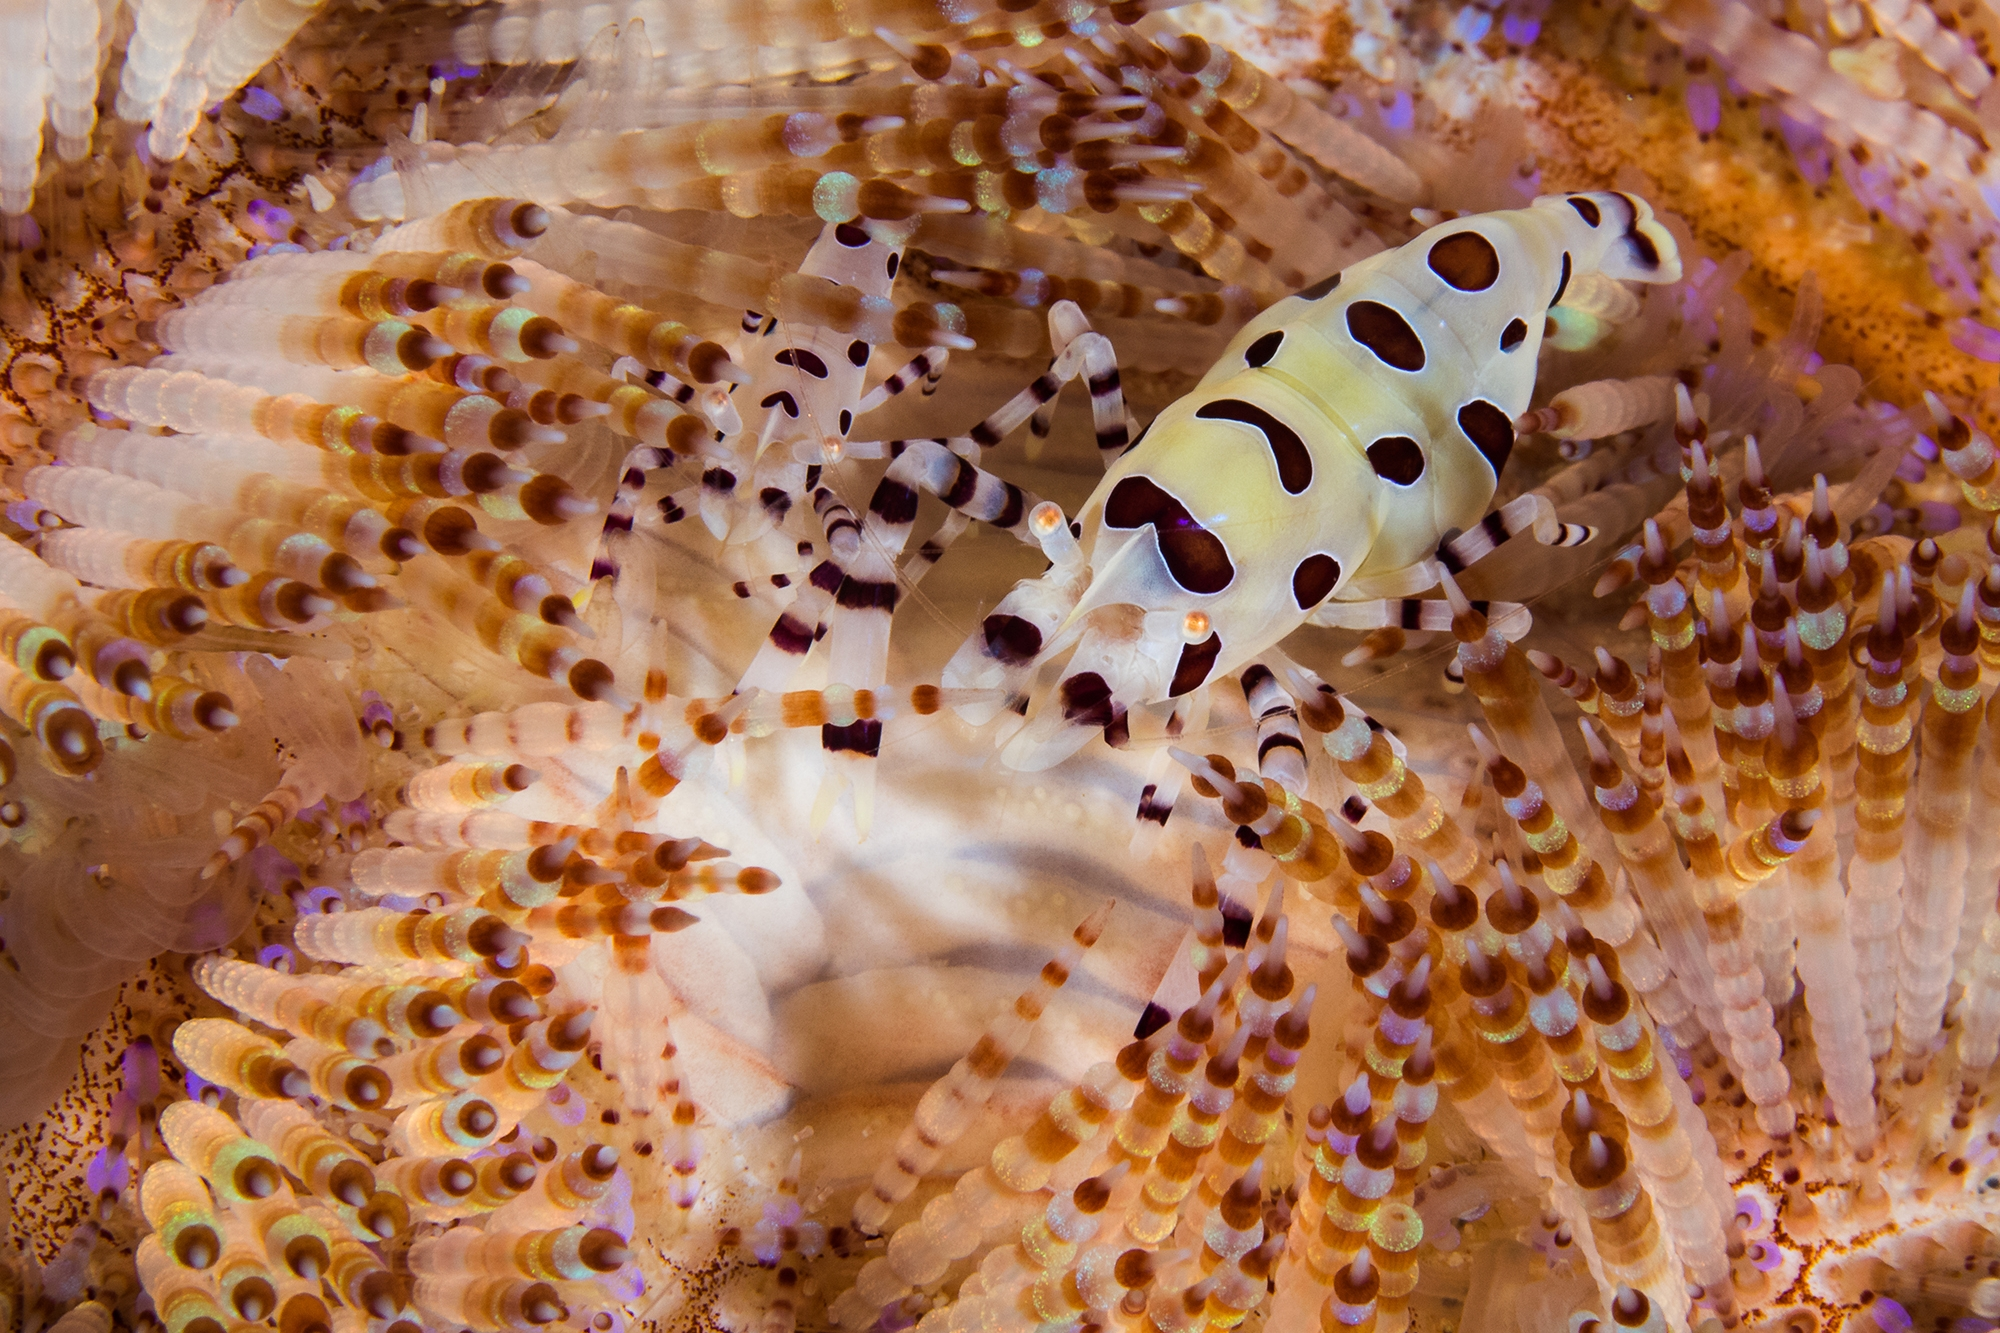 coleman shrimp credit: simon pierce / coral reef image bank